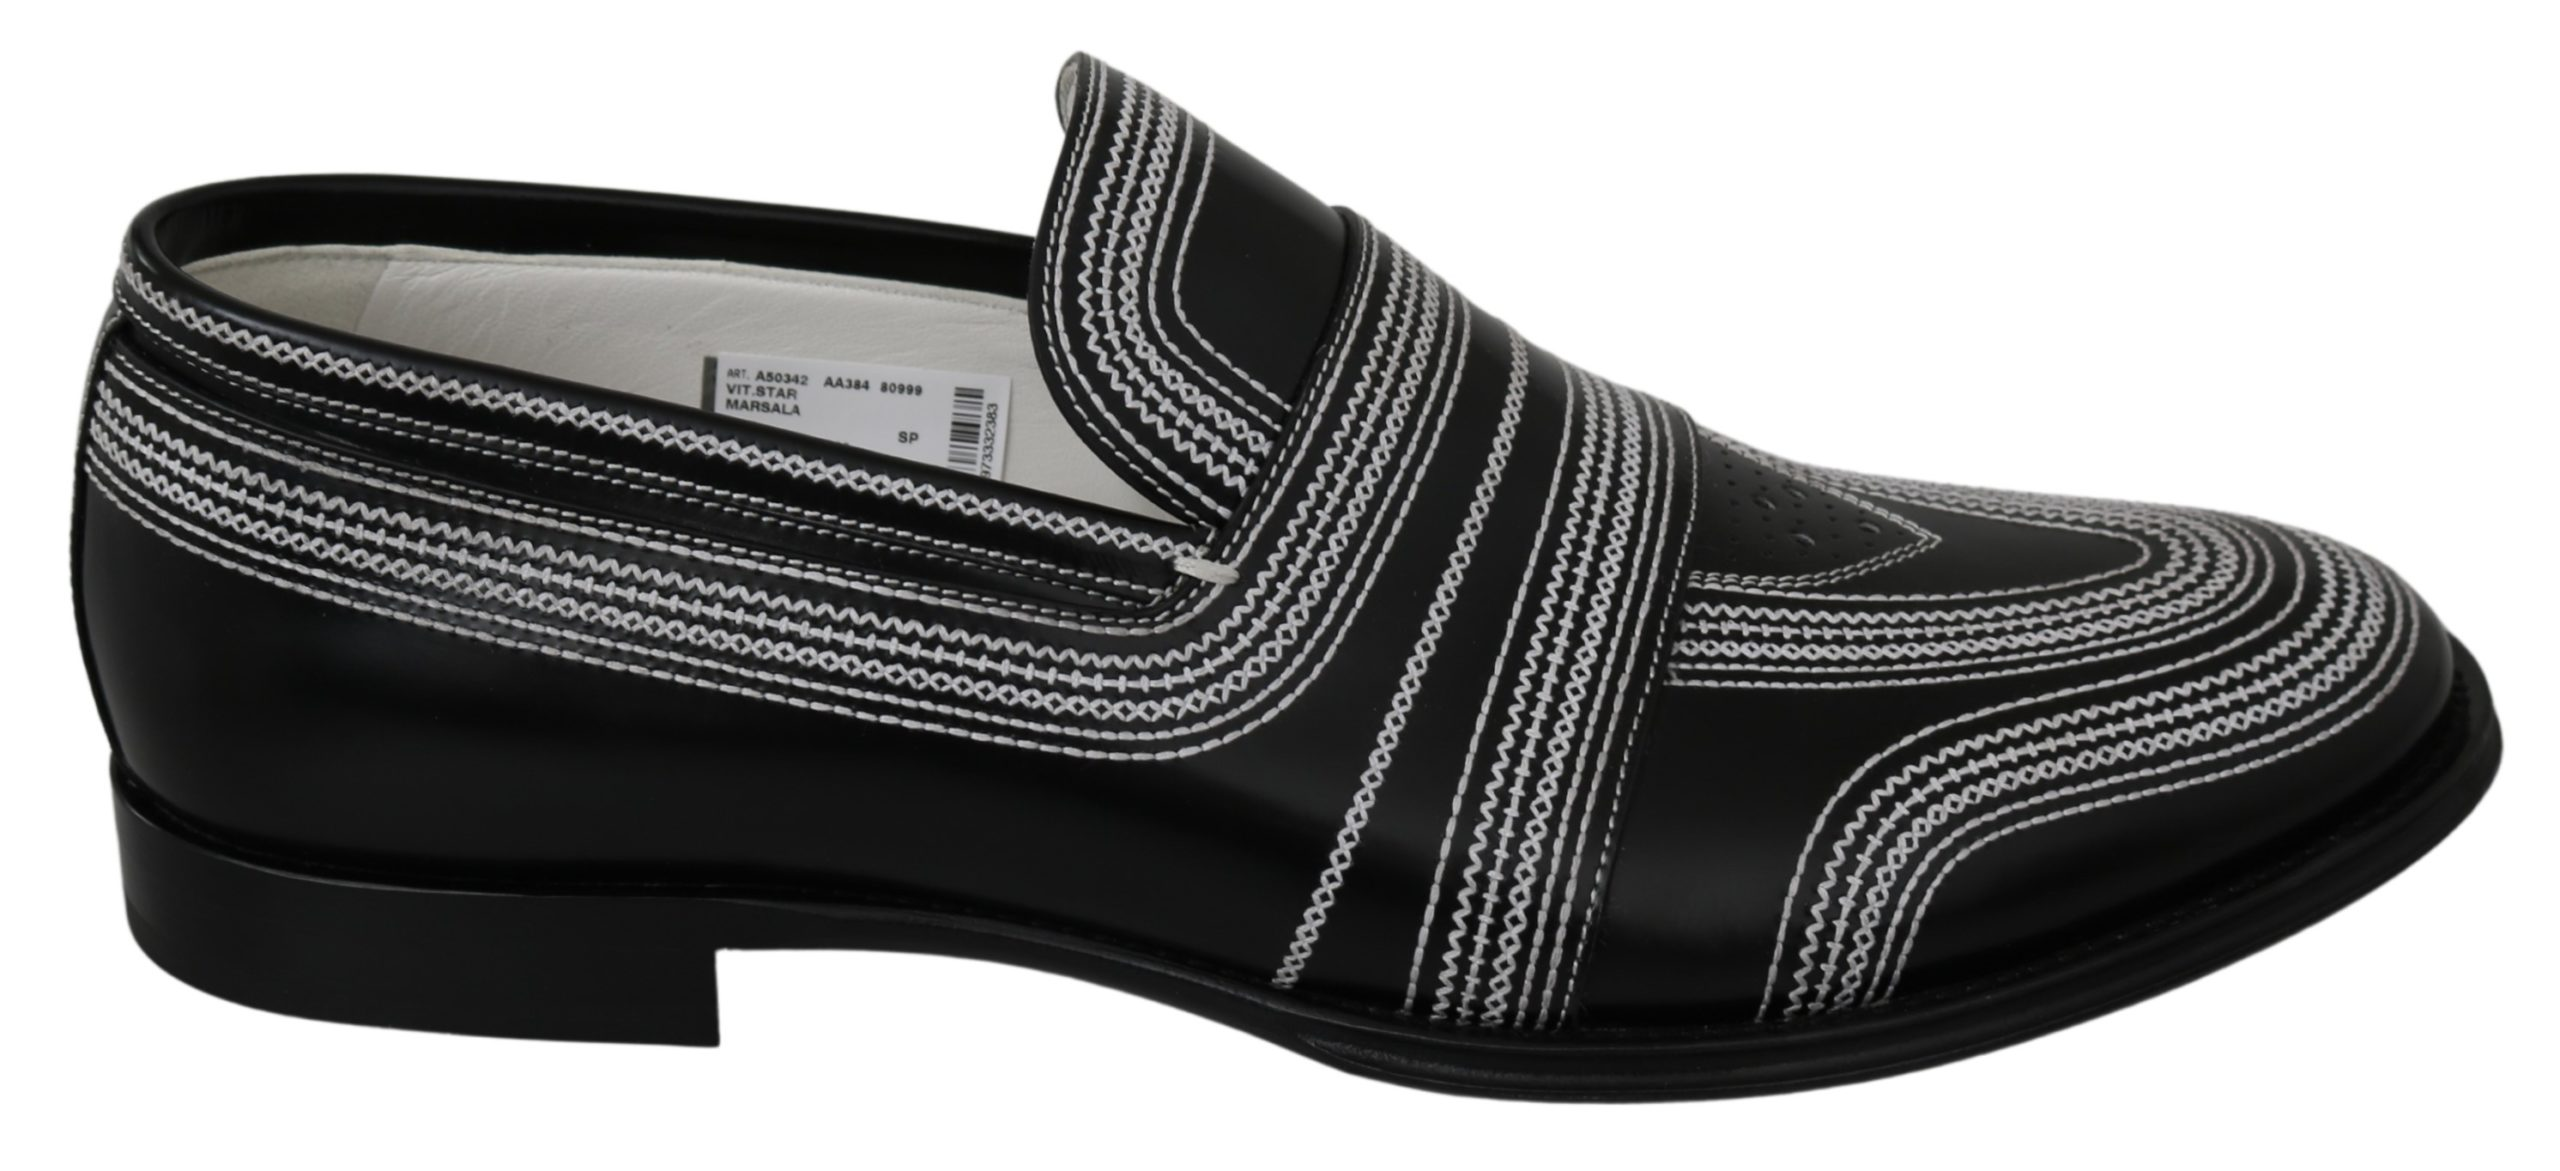 Dolce & Gabbana Men's Leather Loafer Black MV3003 - EU44/US11